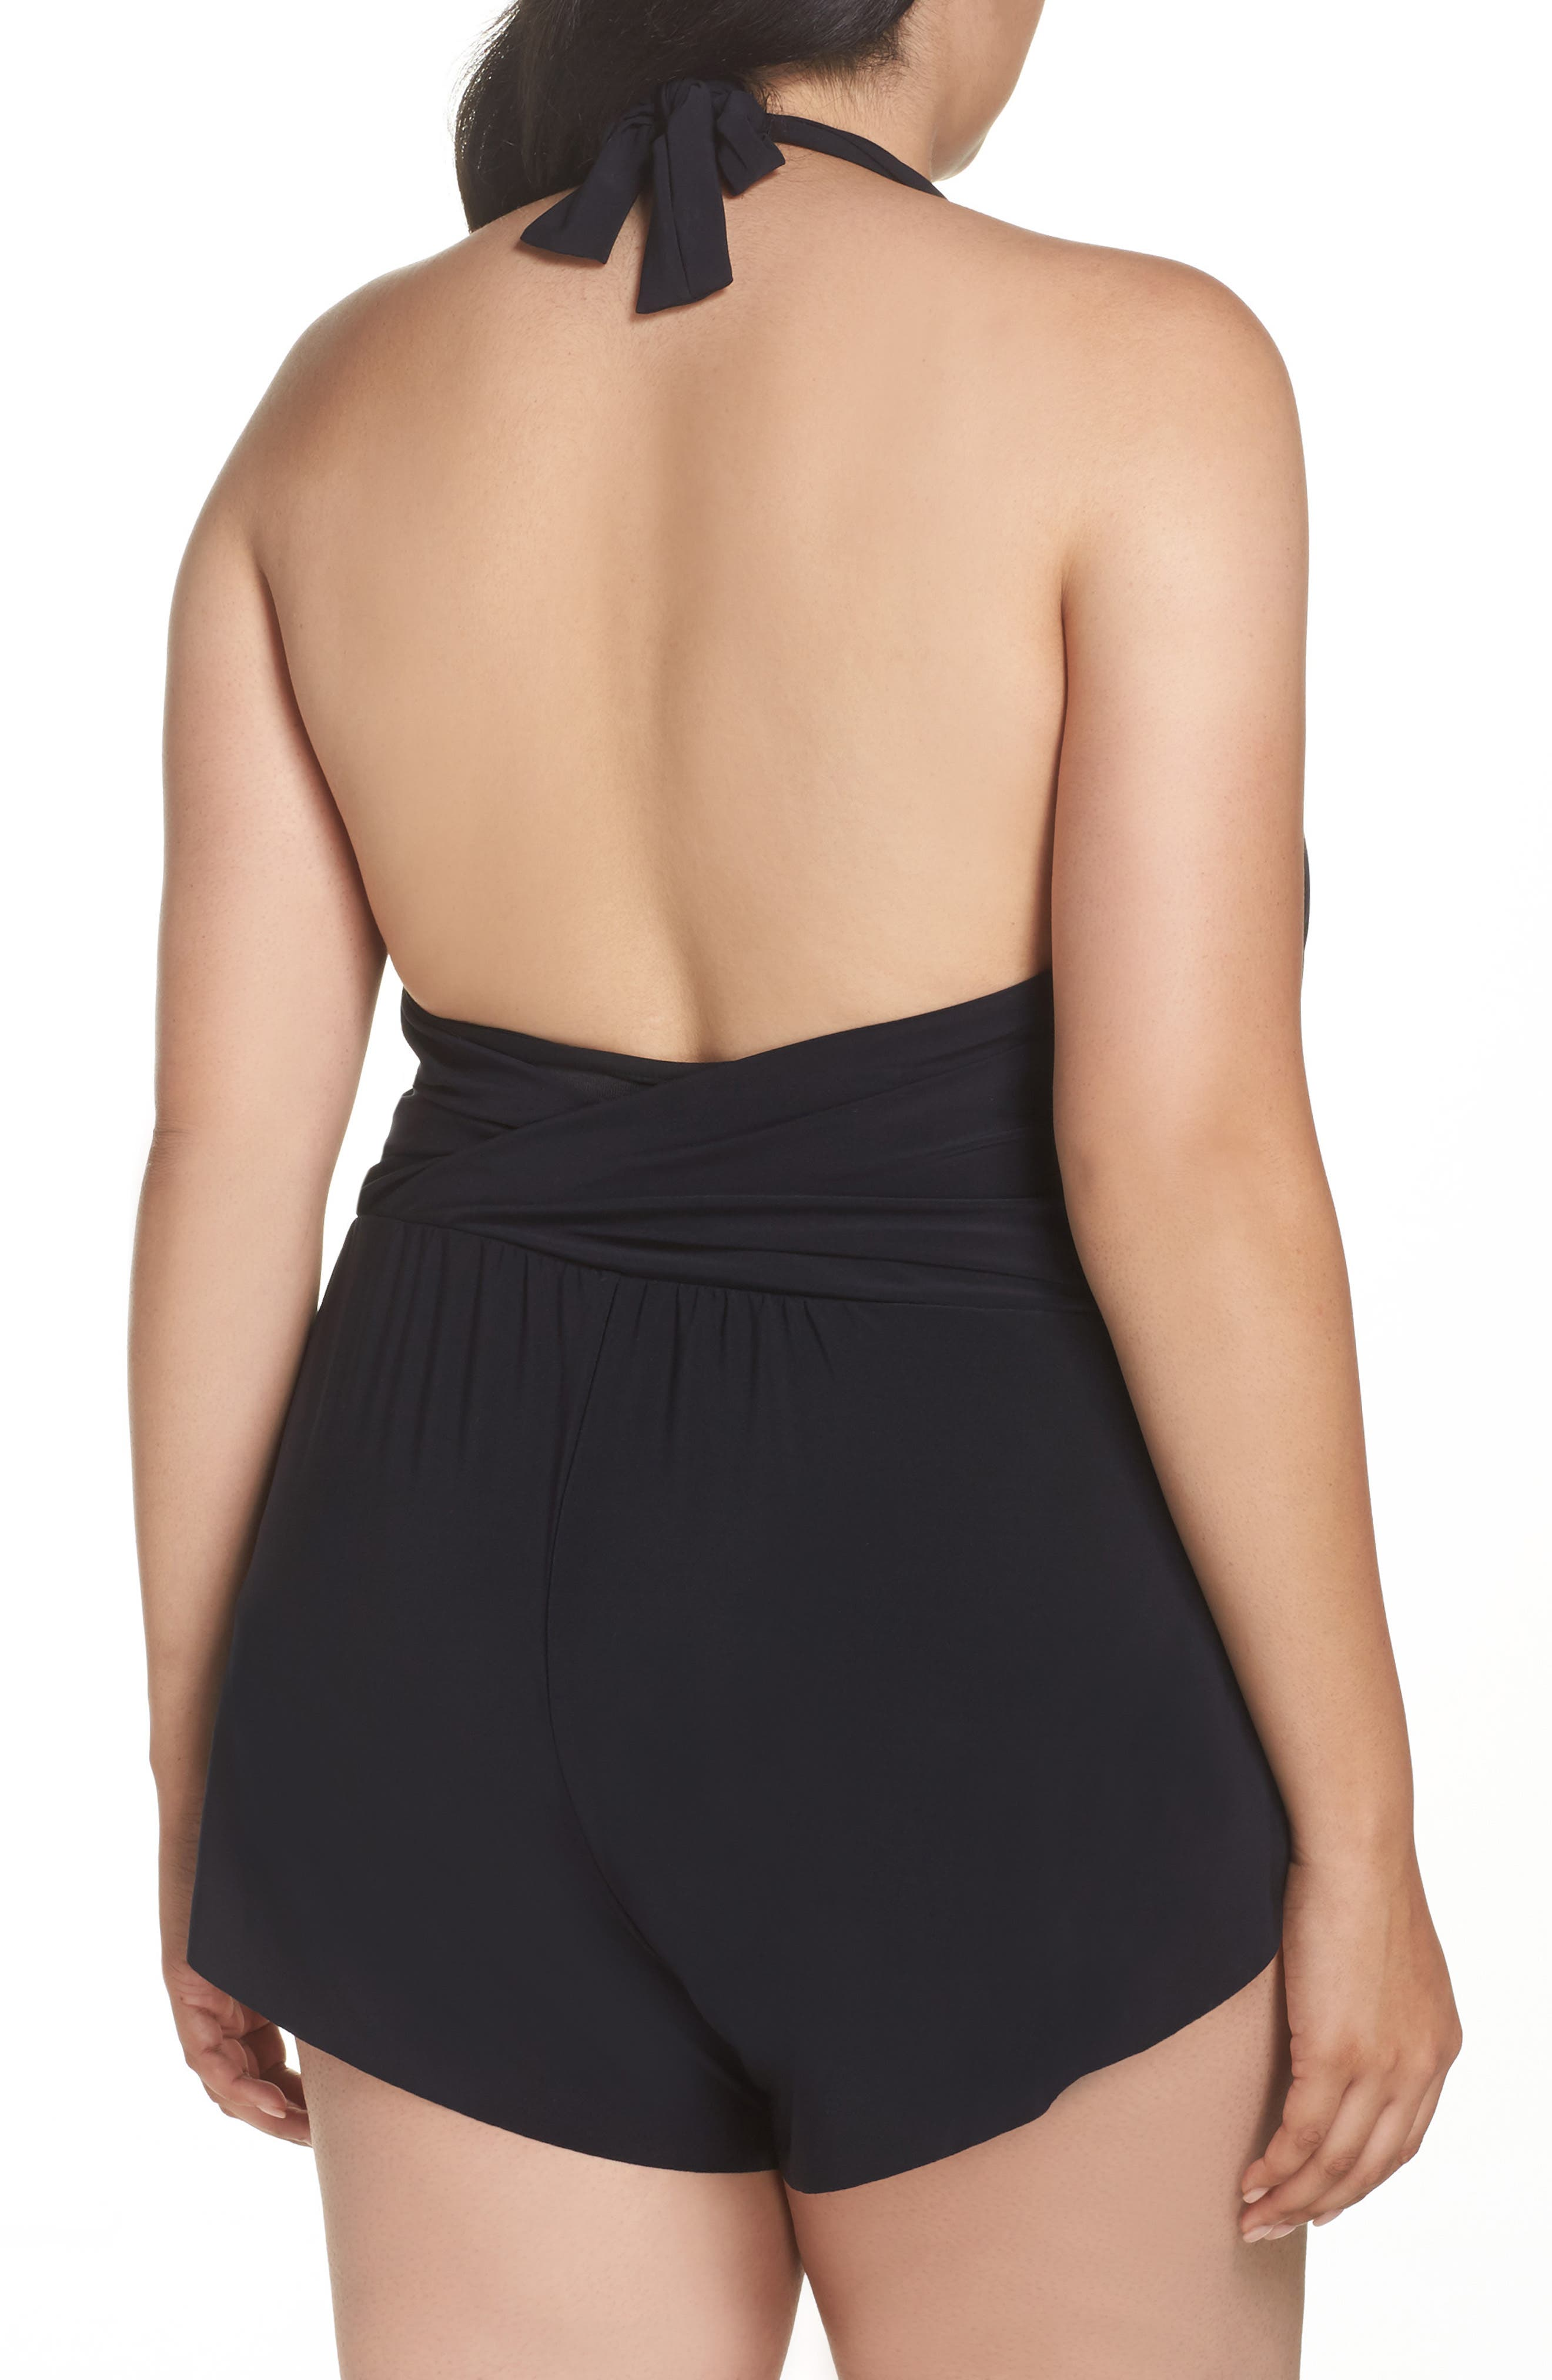 Bianca One-Piece Romper Swimsuit,                             Alternate thumbnail 2, color,                             Black